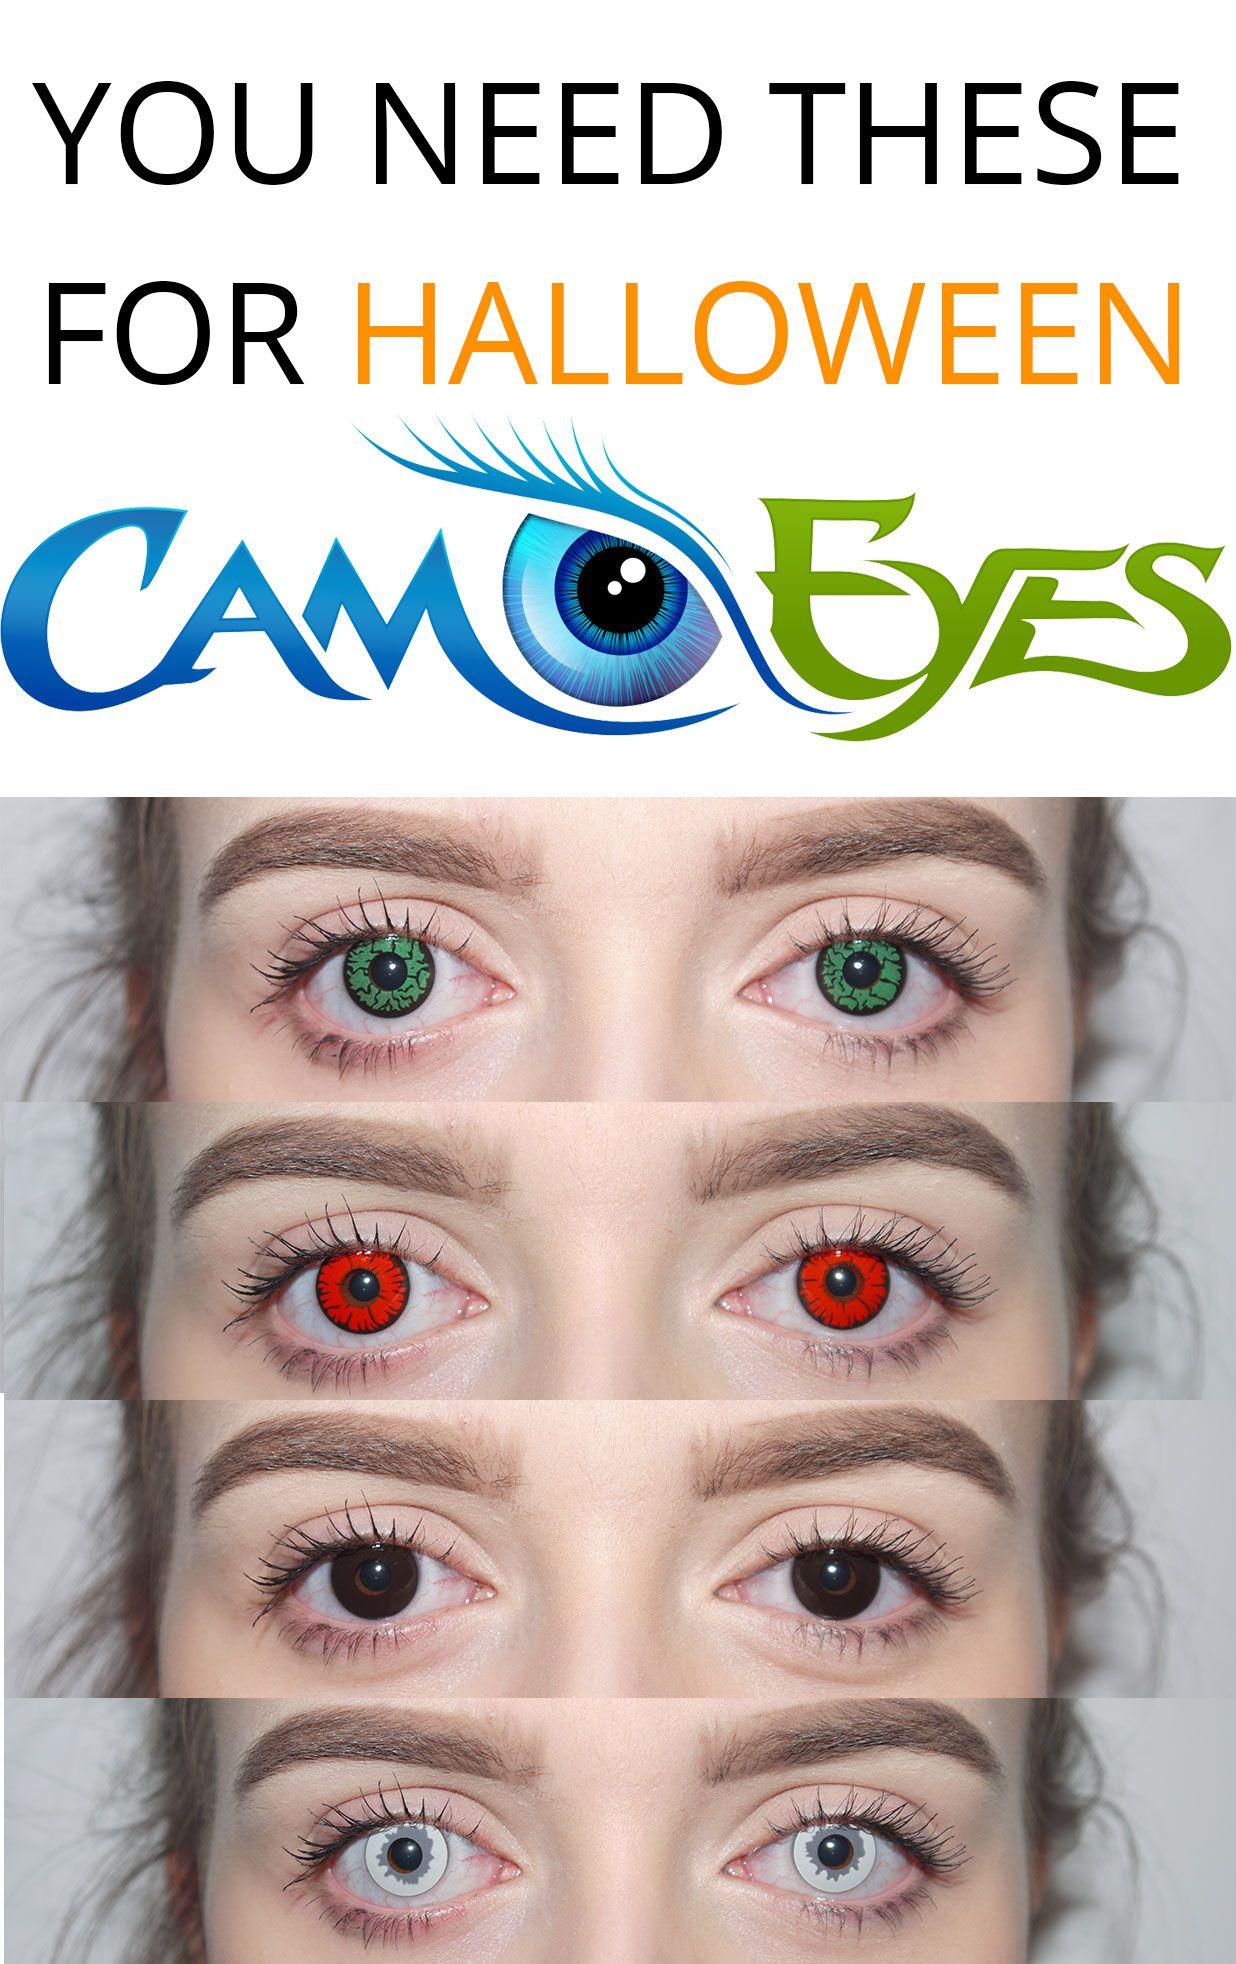 CamoEyes.com | Halloween Contact Lenses The ultimate Halloween ...